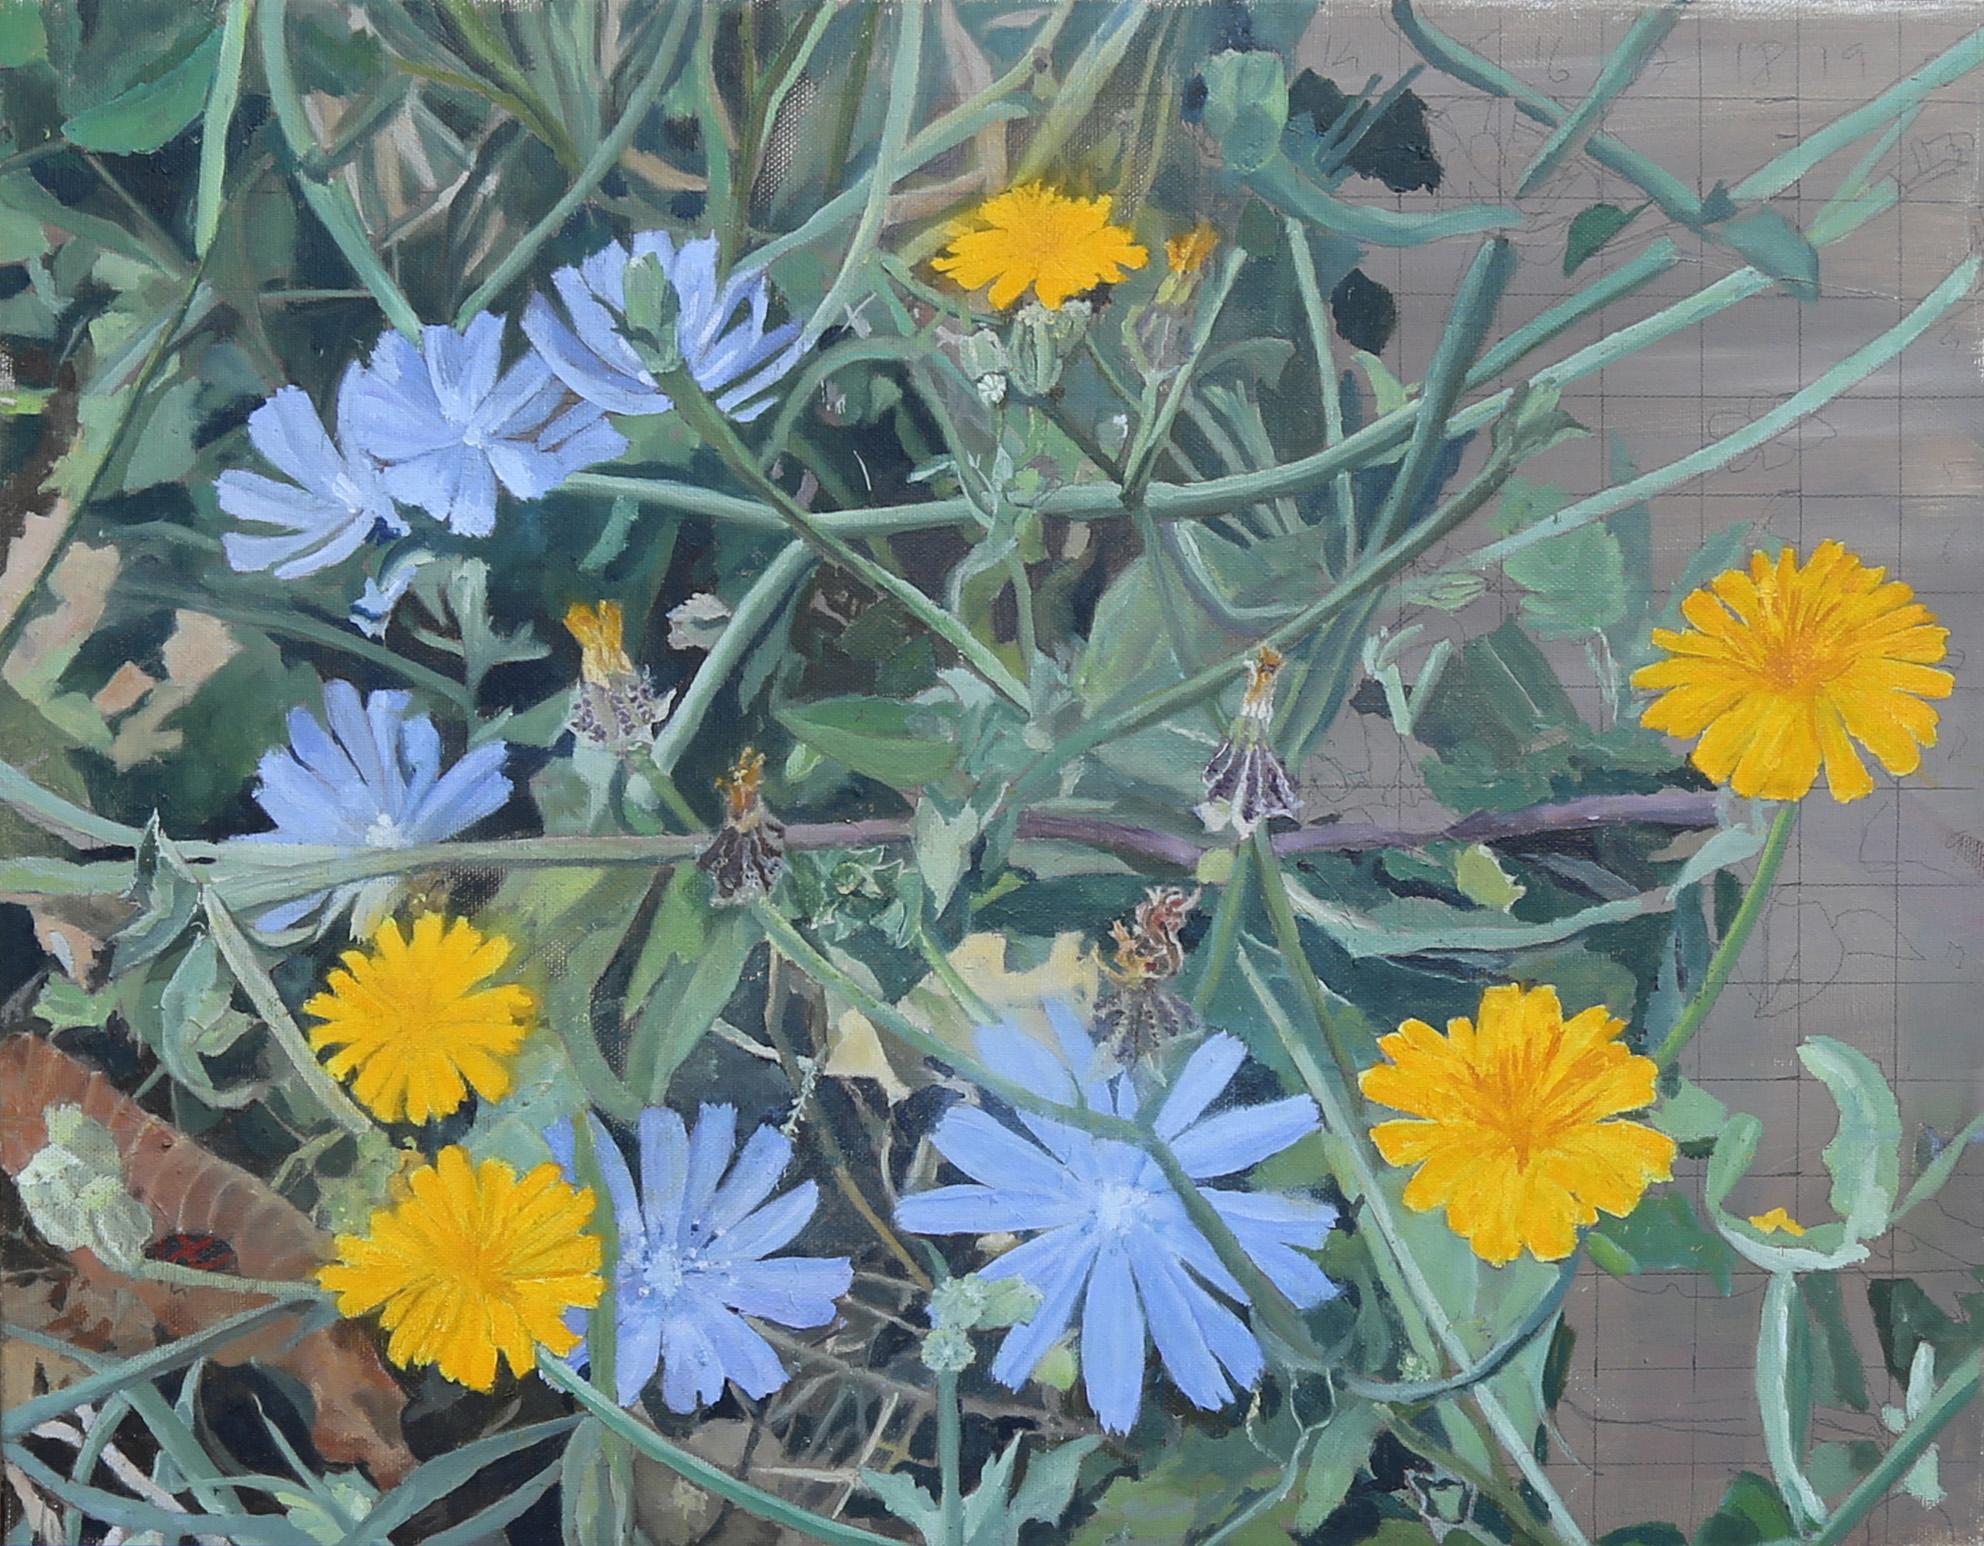 Hawbit and Chicory. Zohar Flax. Jackson's Painting Prize.